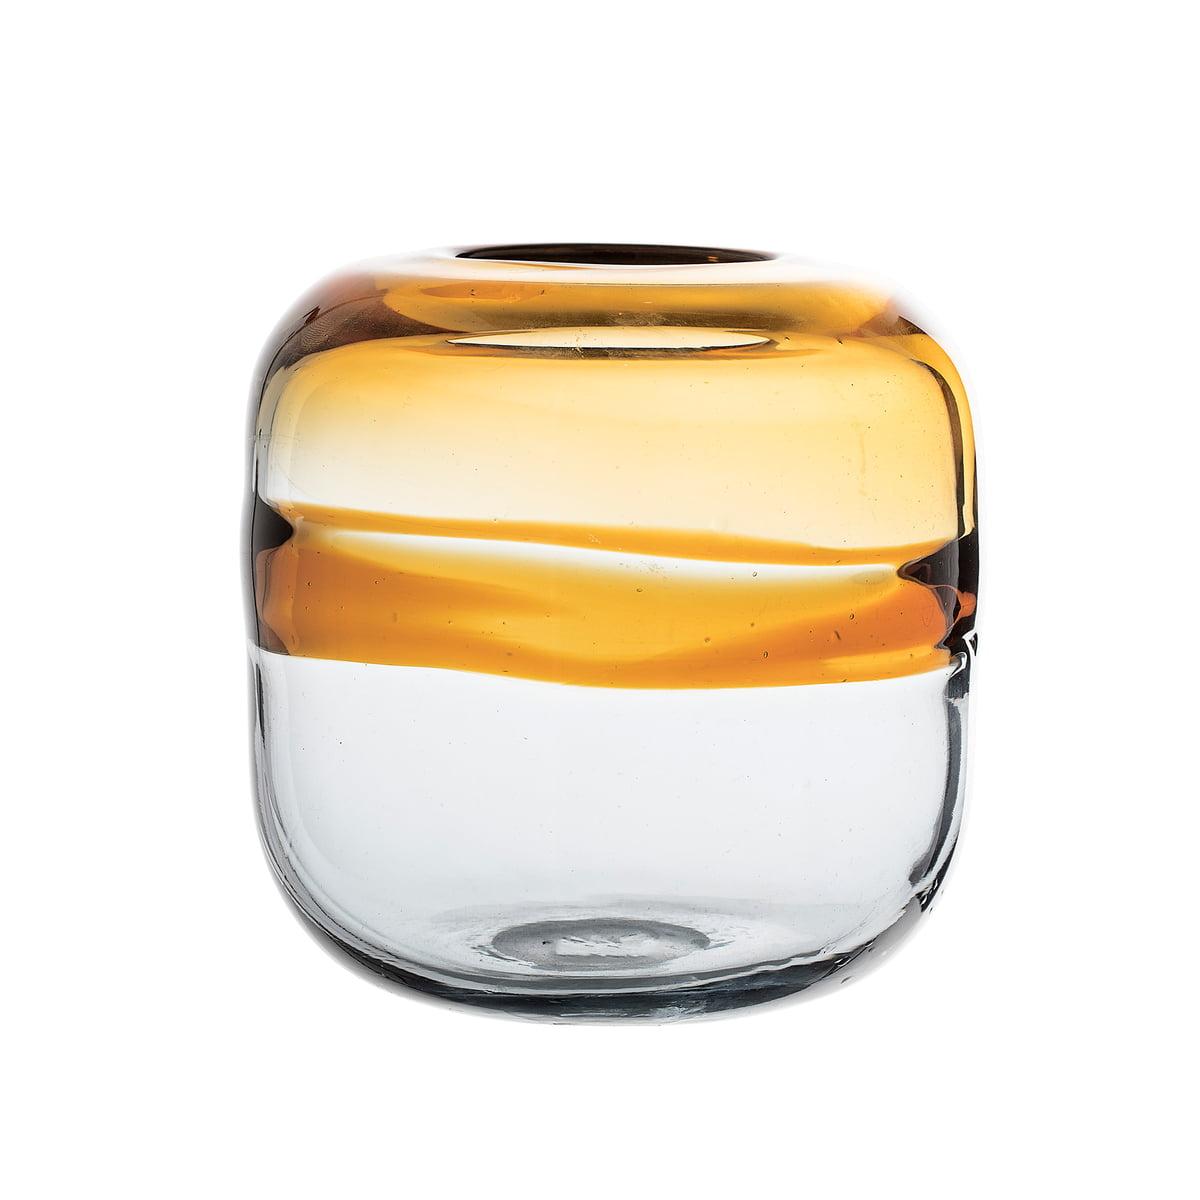 Bloomingville - Glas-Vase H 16,5 cm, braun